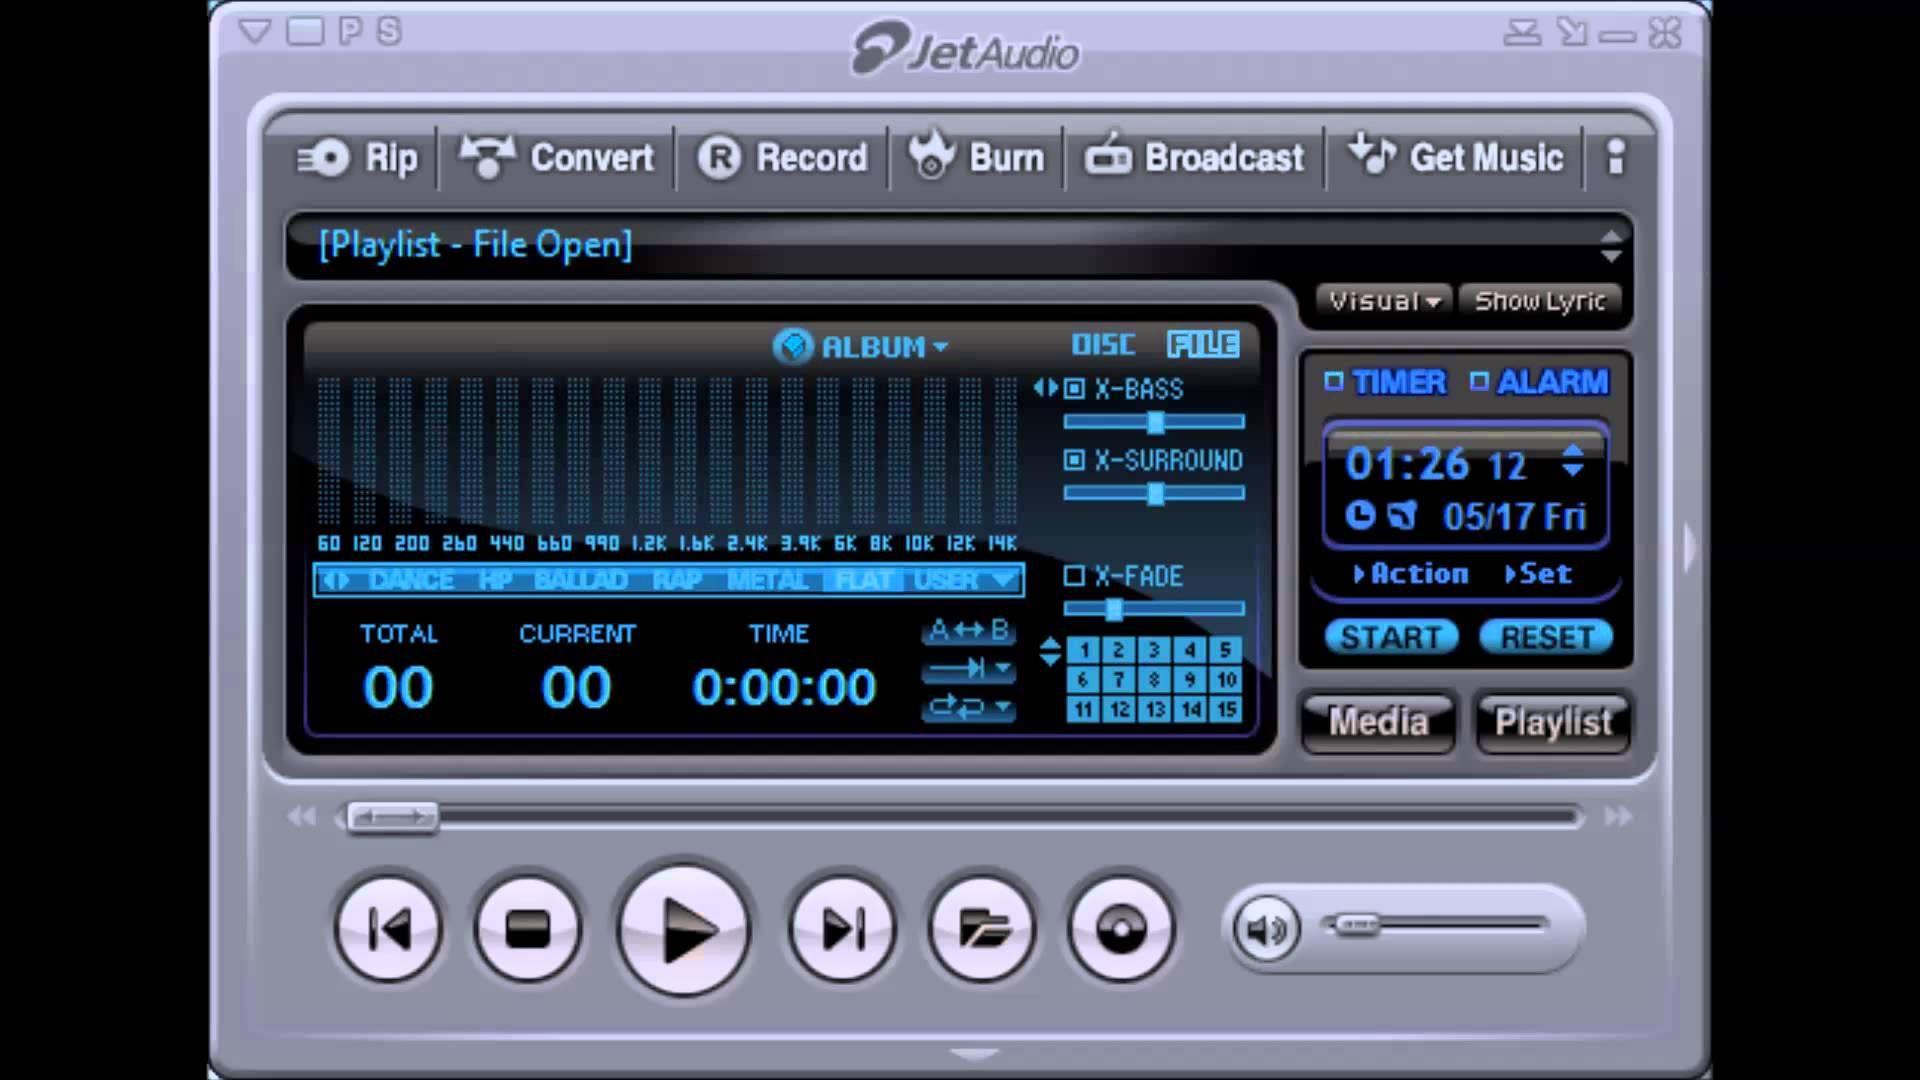 Fsx carenado sr22 gtsx turbo hd series | bradverga